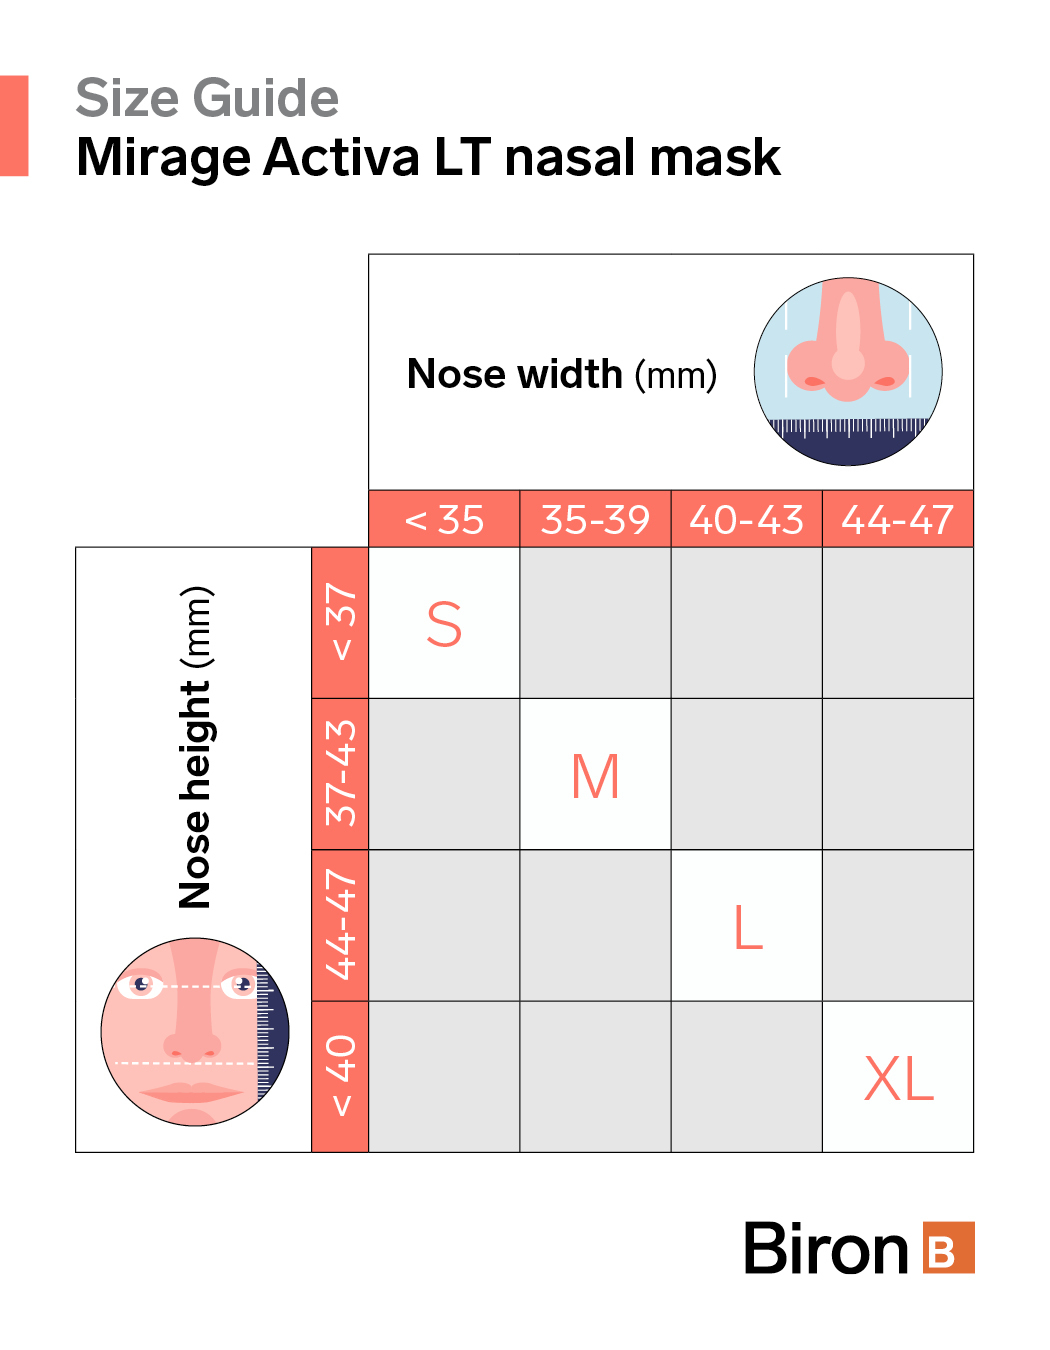 Size guide Mirage Activa LT nasal mask